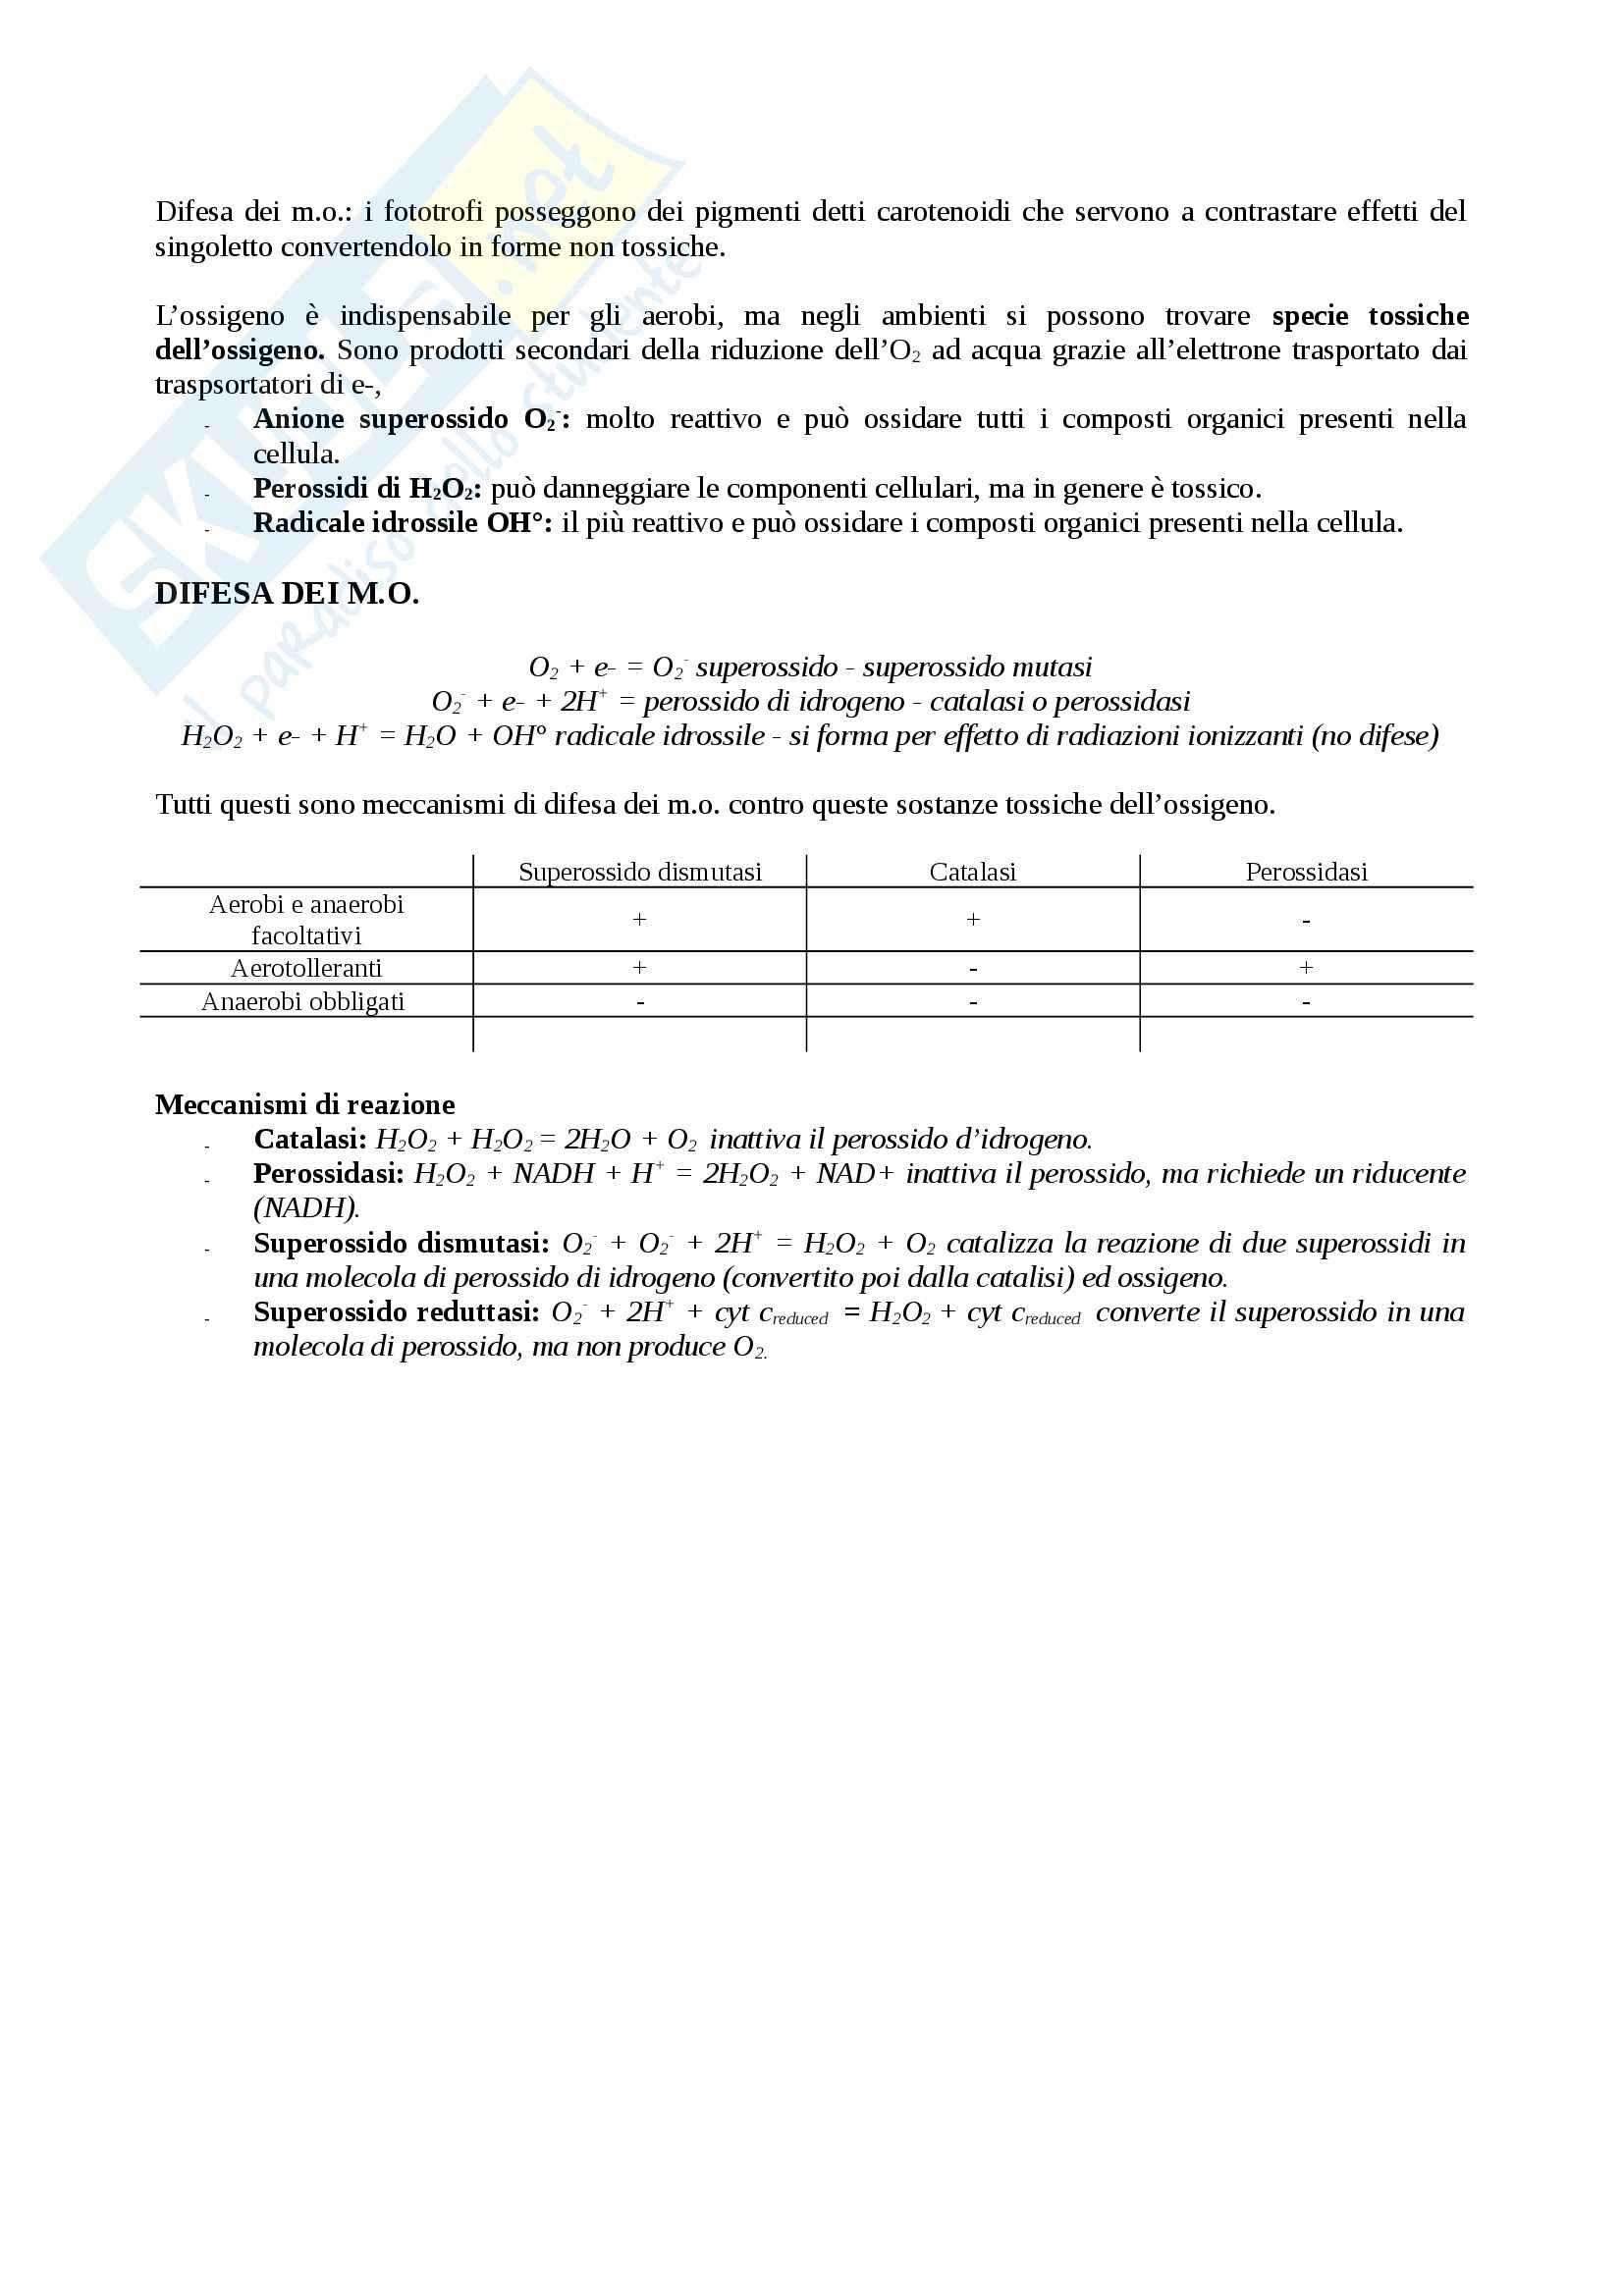 Microbiologia agraria - Appunti Pag. 76